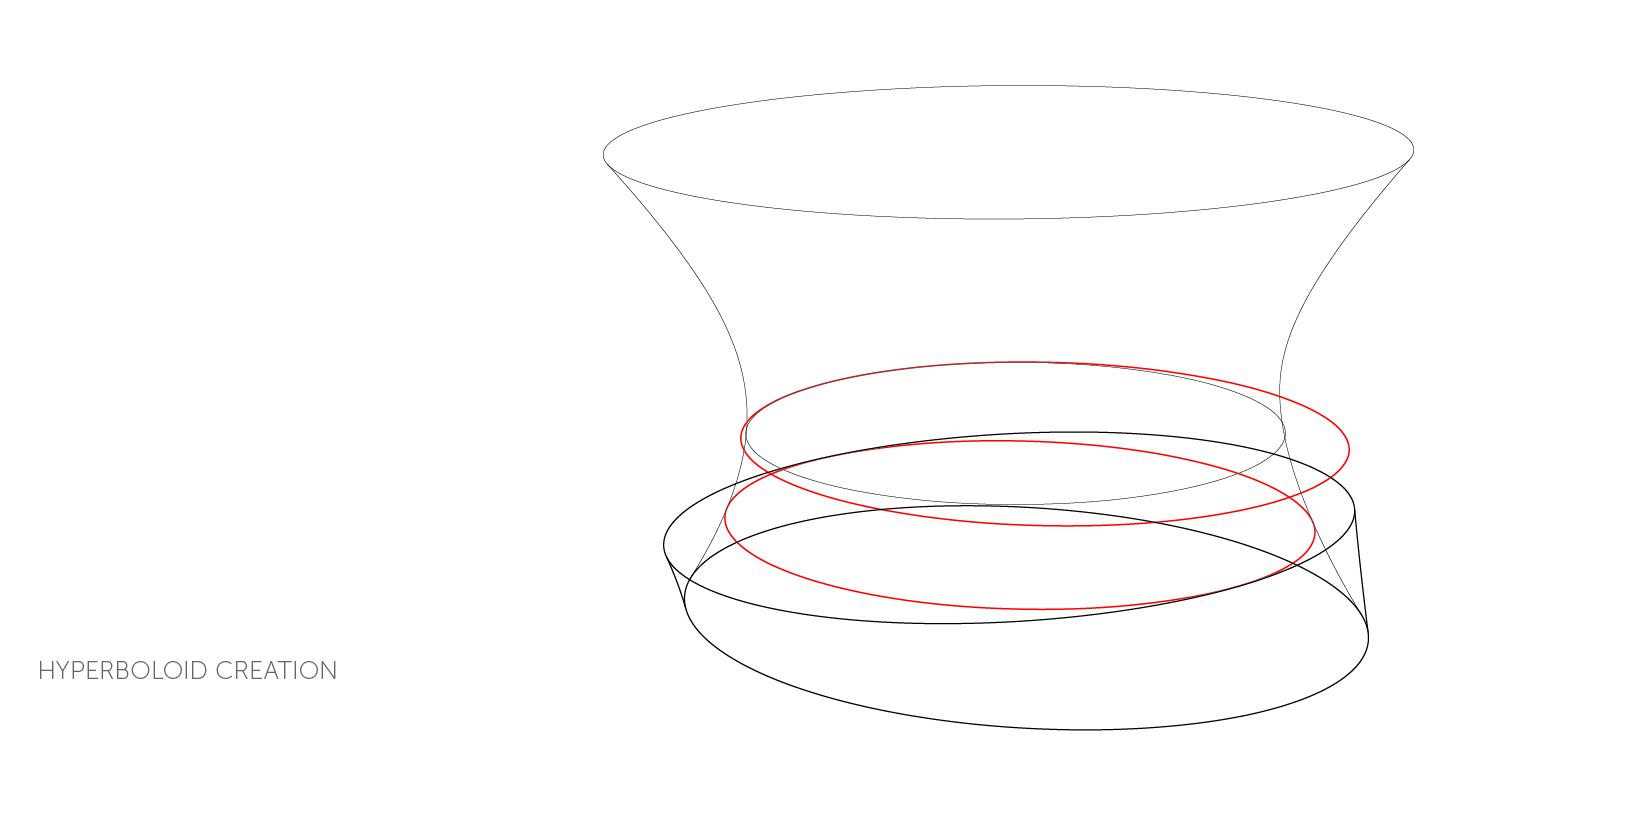 Hyperboloid Diagram_JS-21.jpg